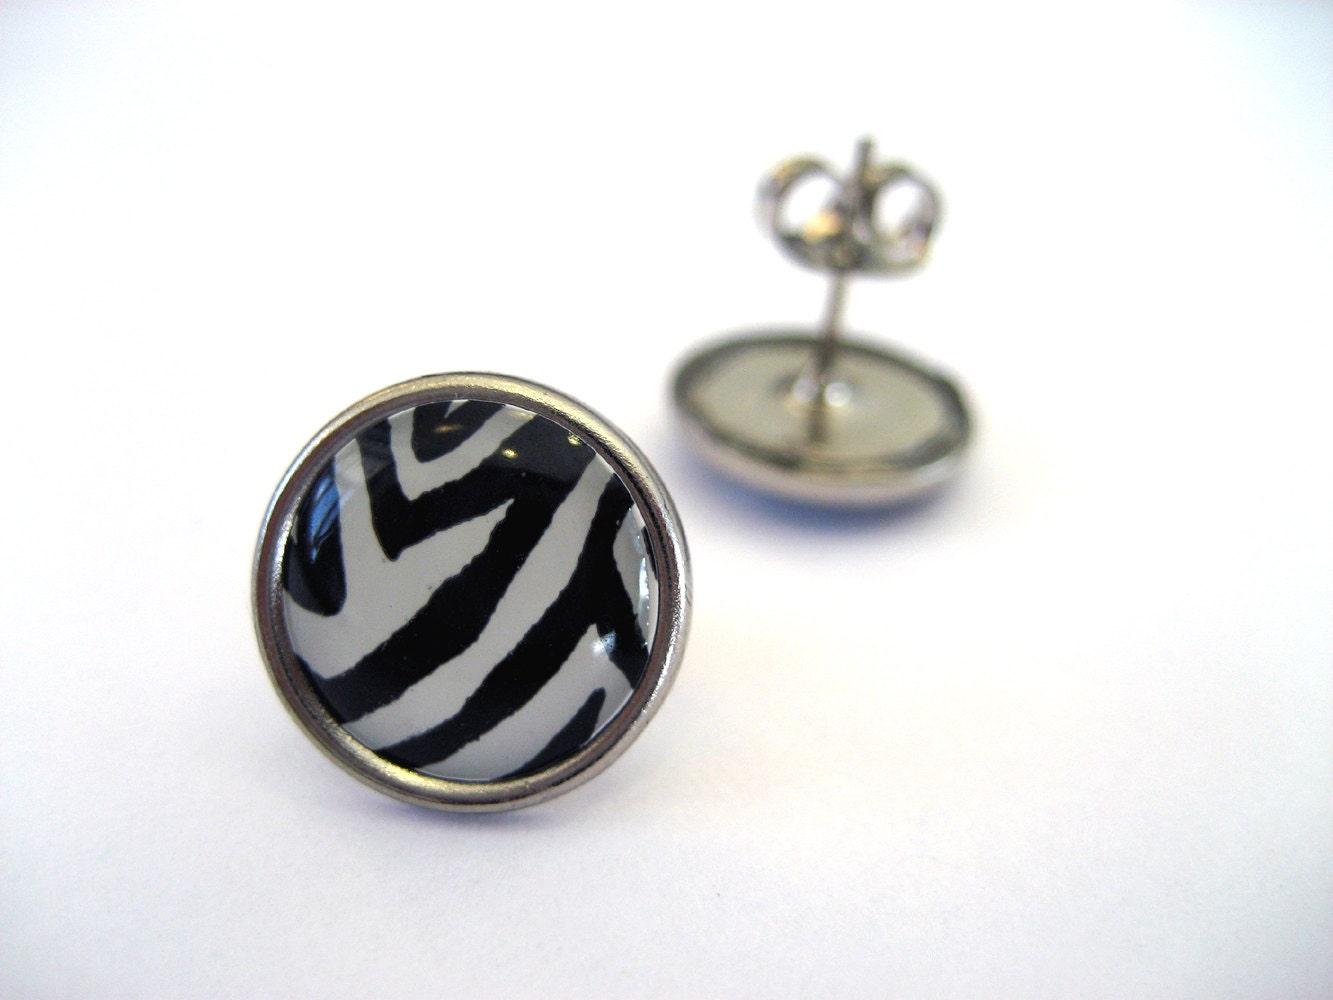 Zebra Studs - Black and White circular animal print post earrings - NightsRequiem